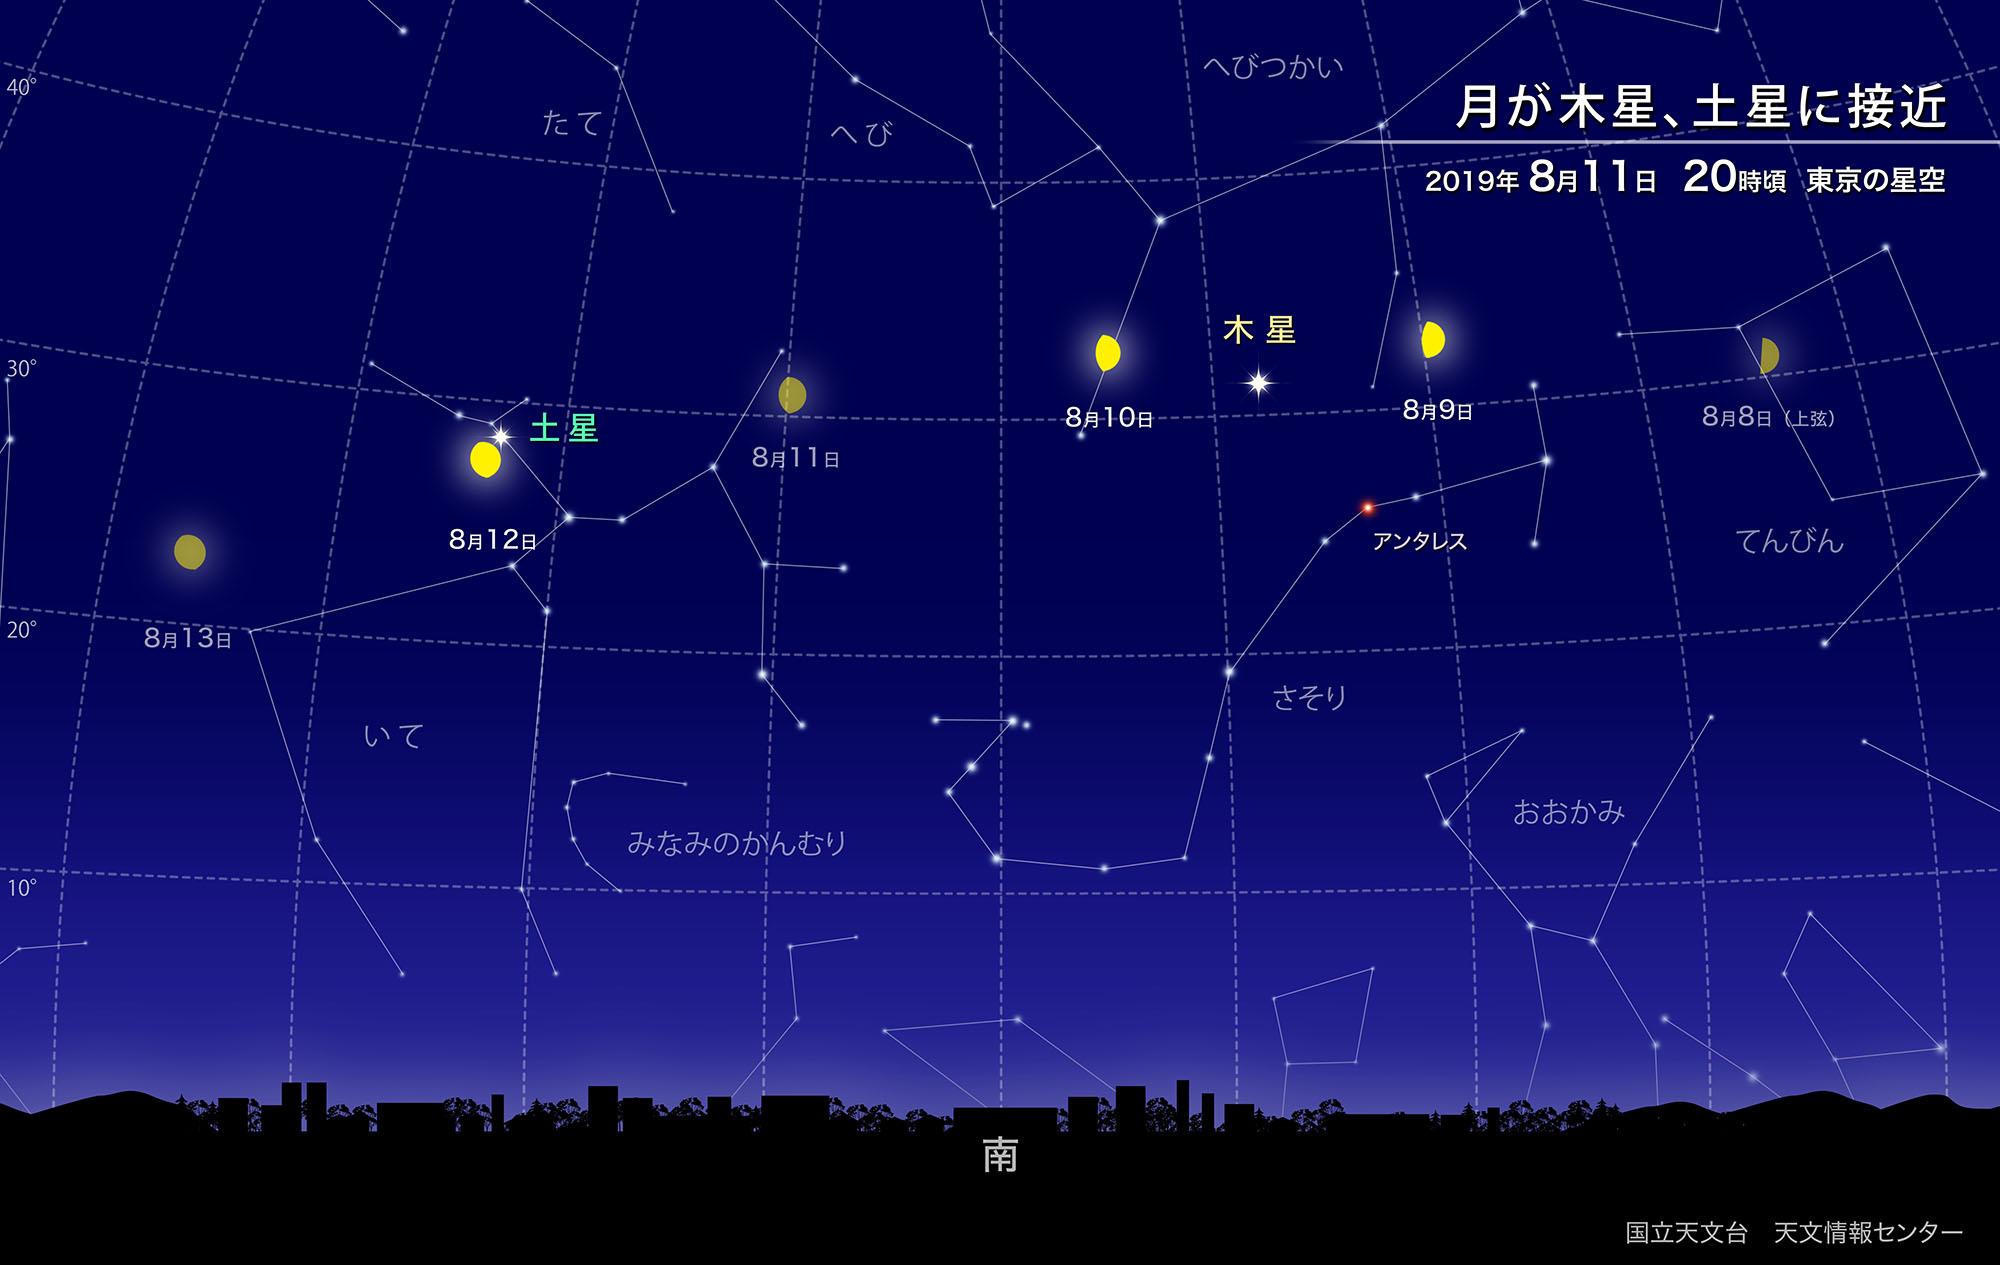 自然科学研究機構 国立天文台月が木星、土星に接近(2019年8月)